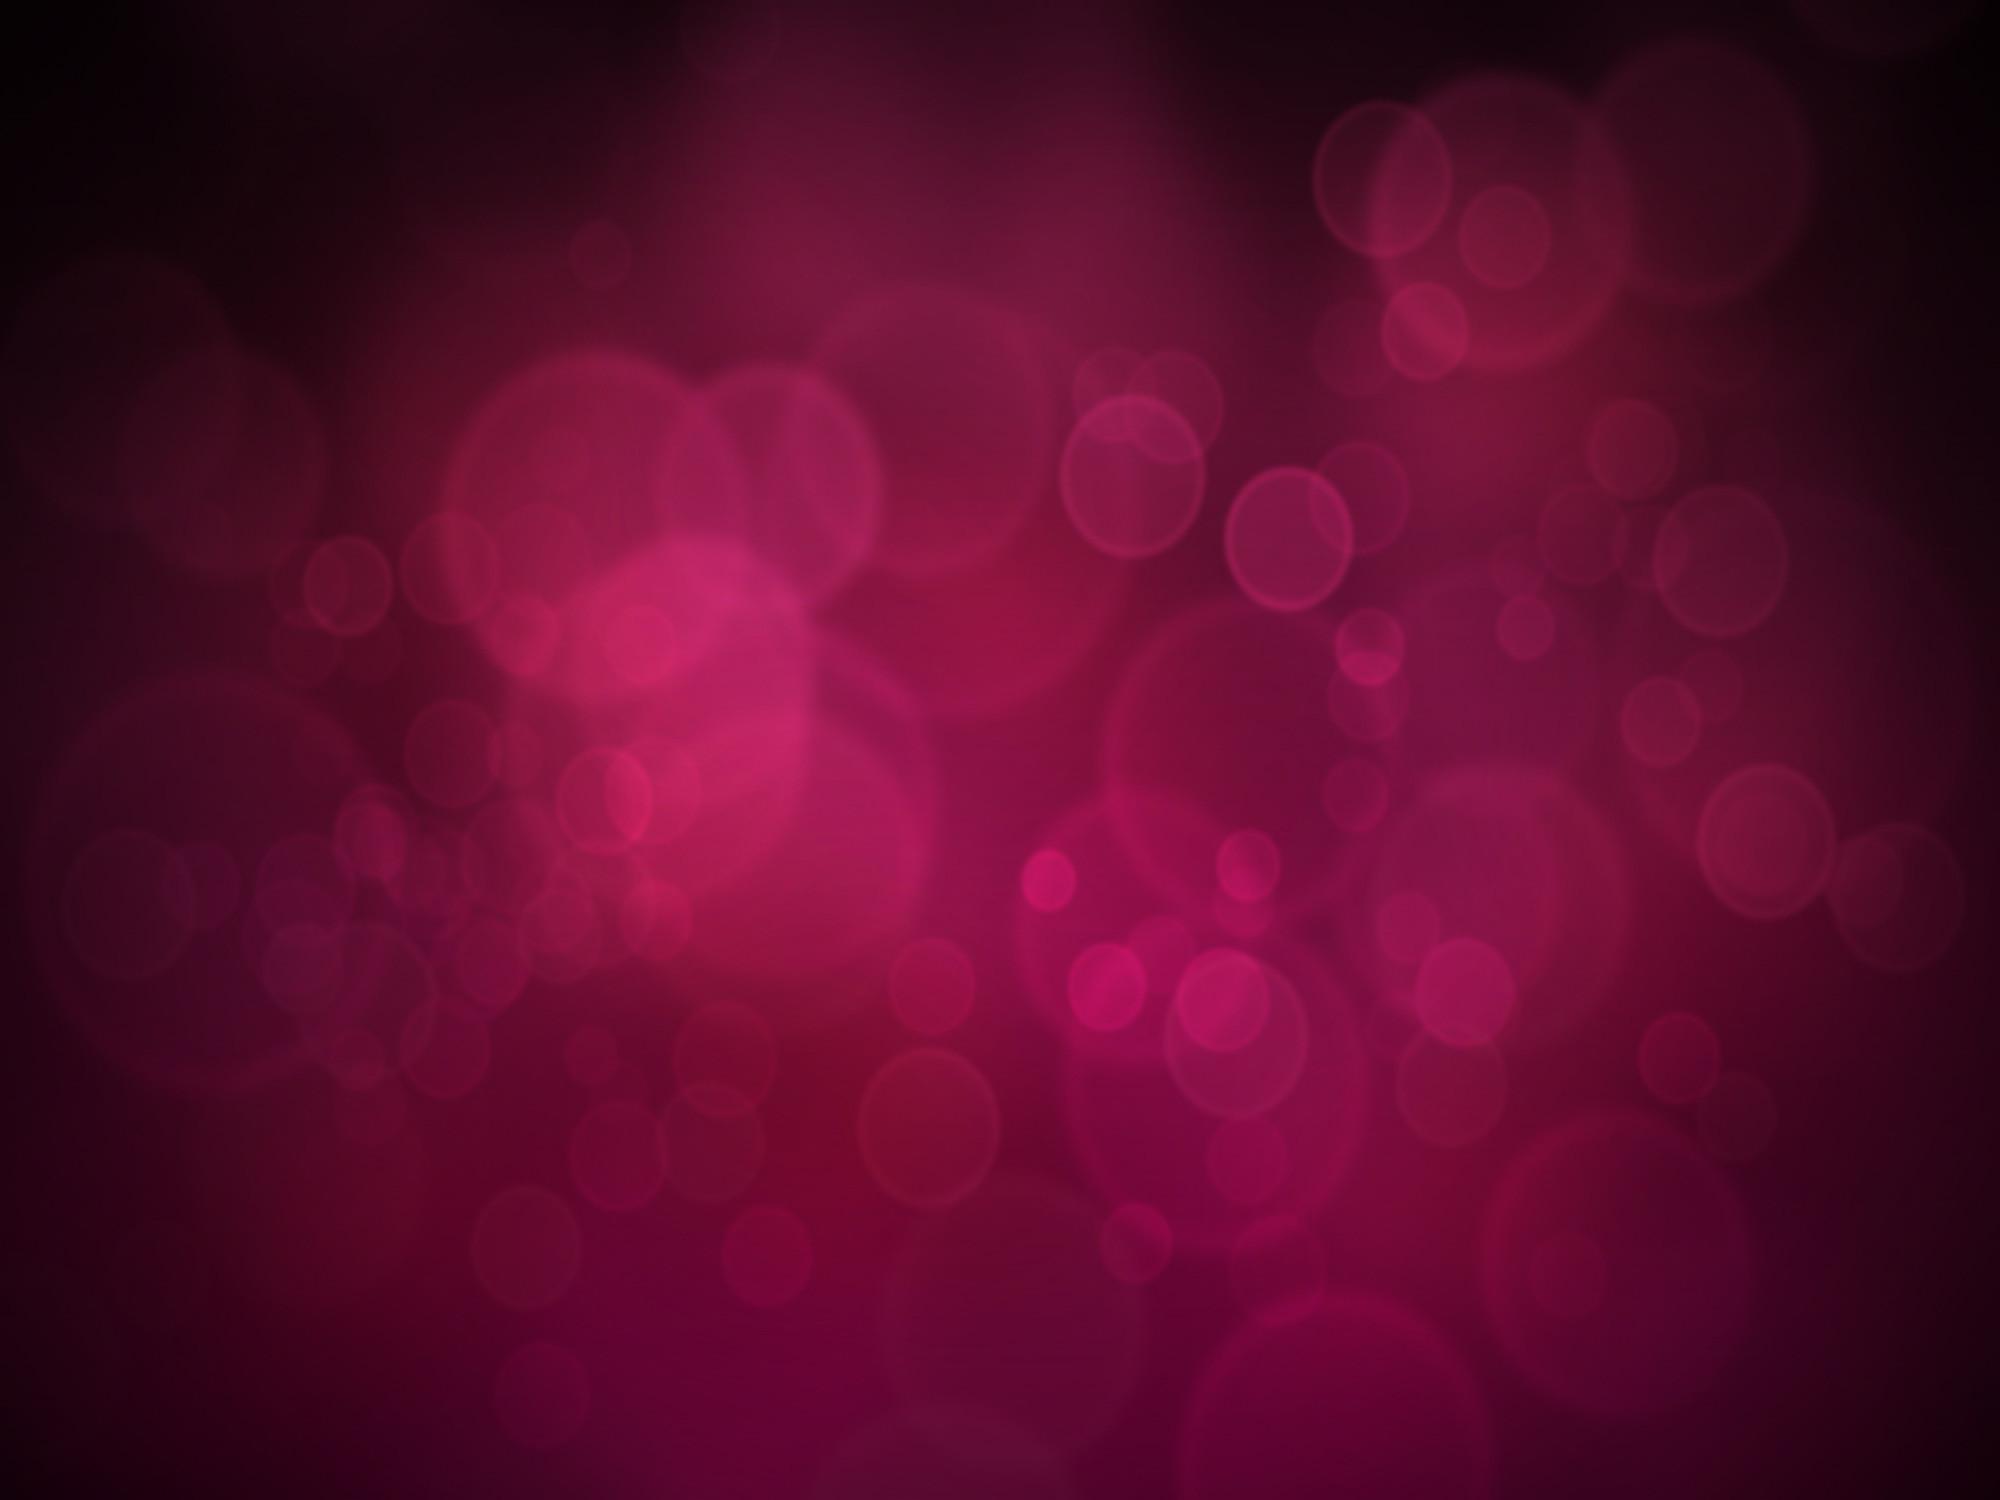 Wallpaper Points, <b>Pink</b>-<b>Black</b> Background, Bubbles, Reflections  <b>.